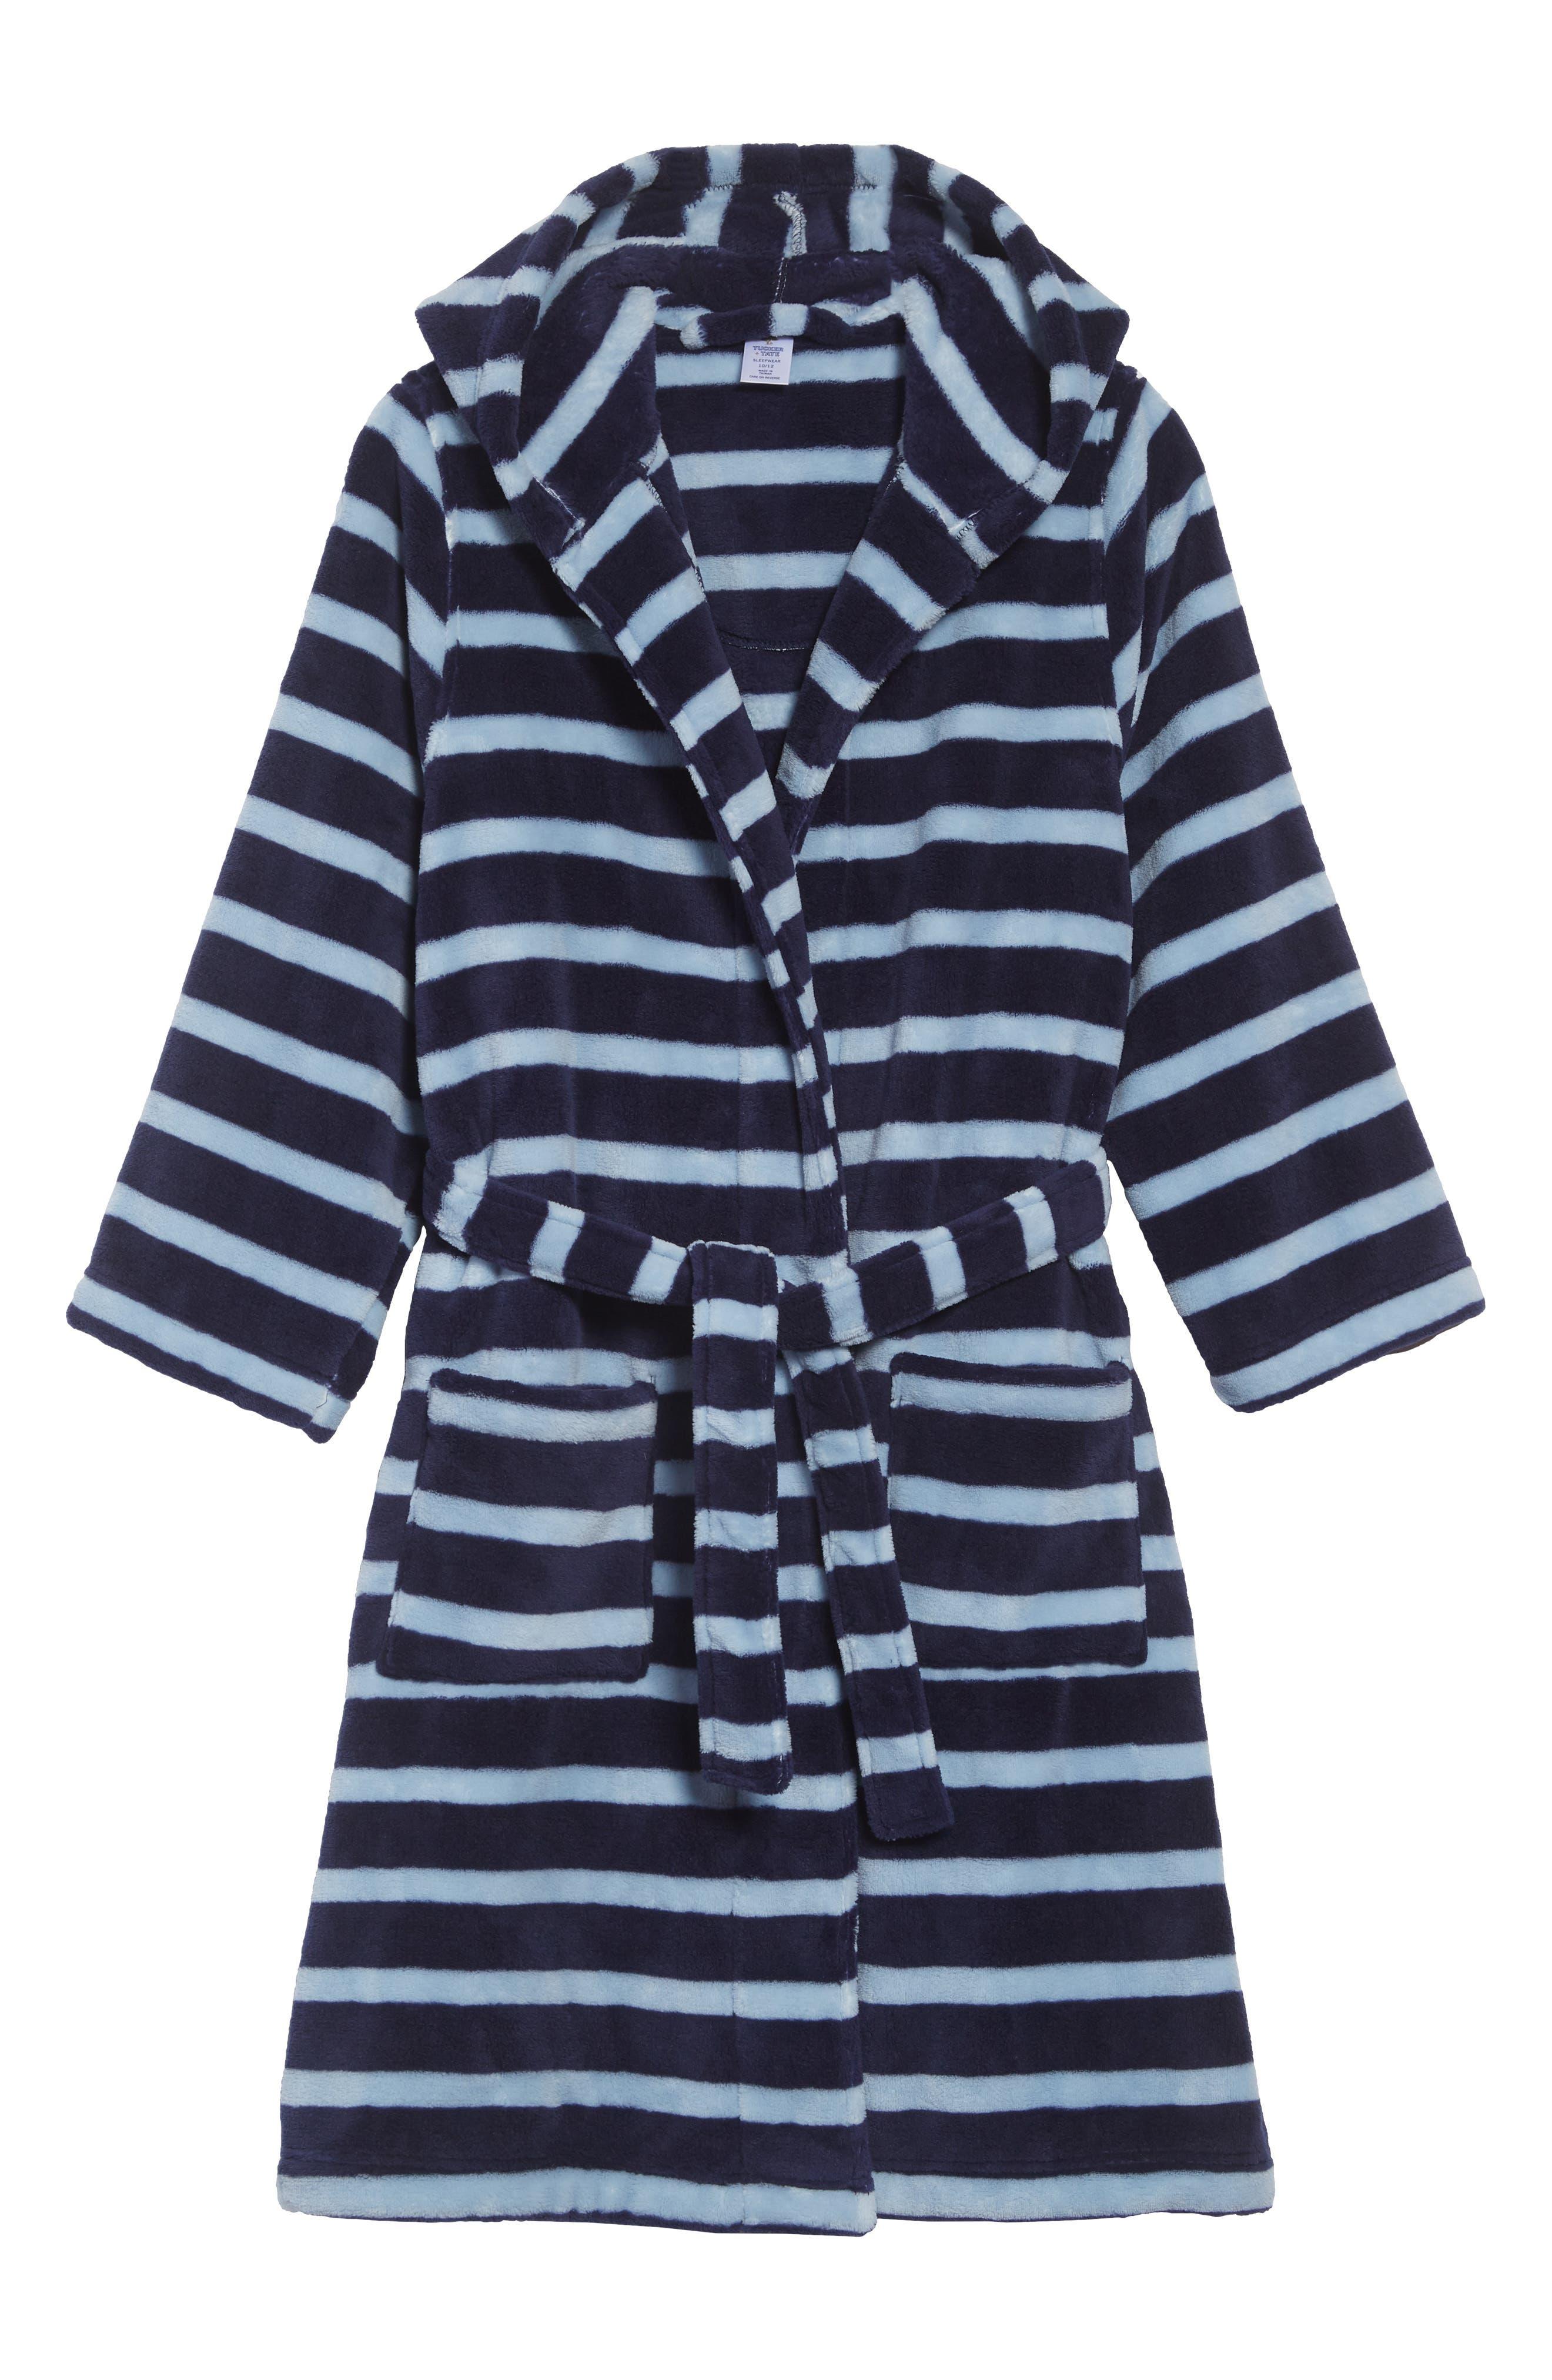 TUCKER + TATE Hooded Plush Robe, Main, color, 410